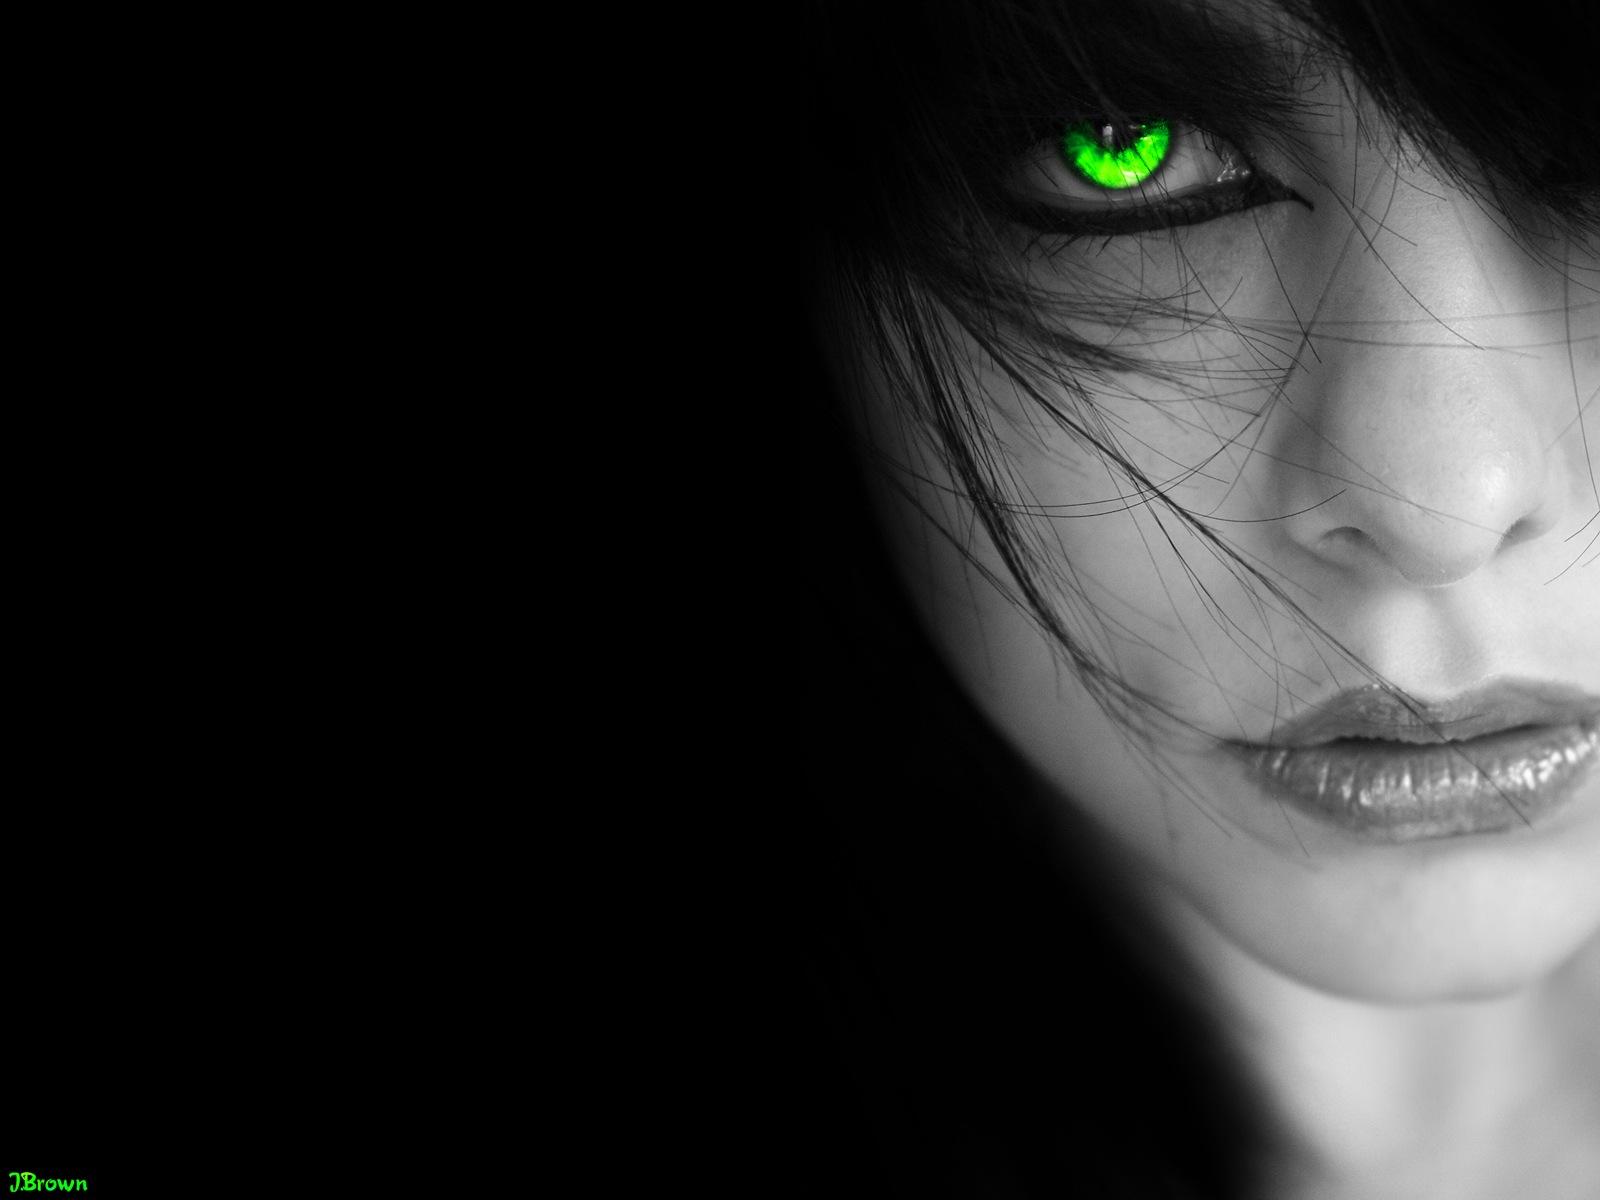 Green Eyes Wallpaper 1600x1200 Green Eyes Girl Dance 1600x1200